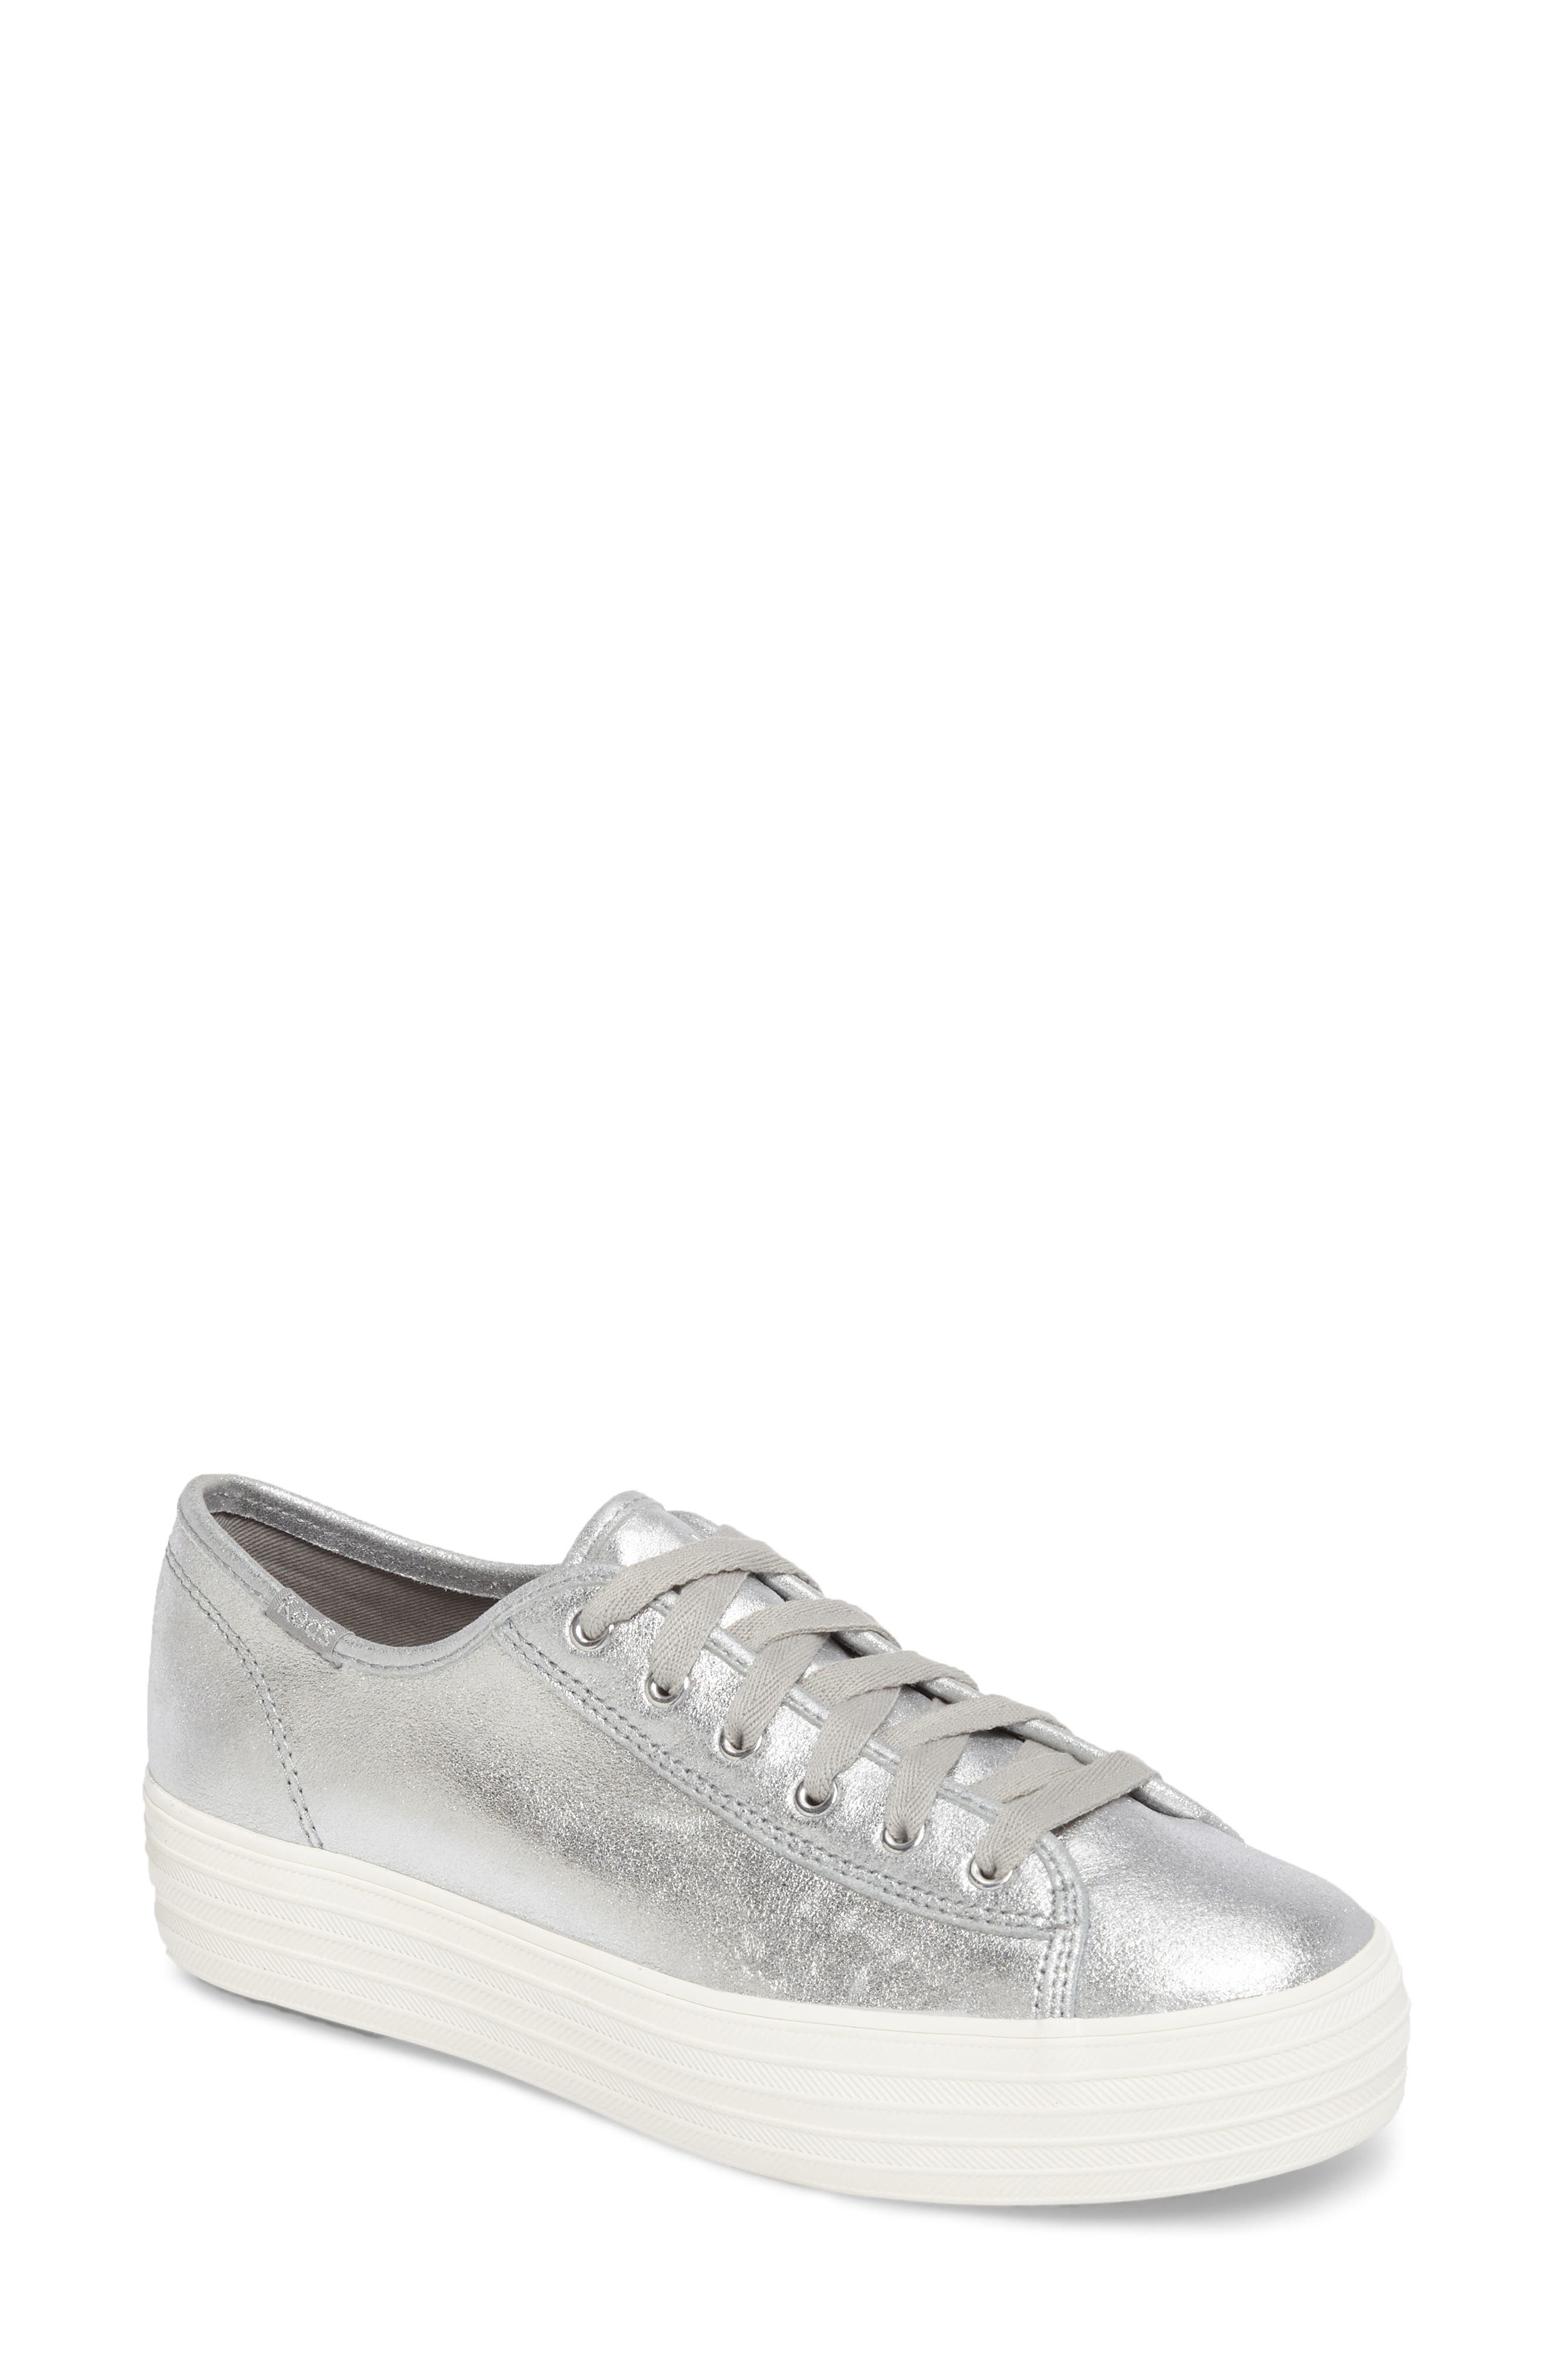 Triple Kick Platform Sneaker,                         Main,                         color, Silver